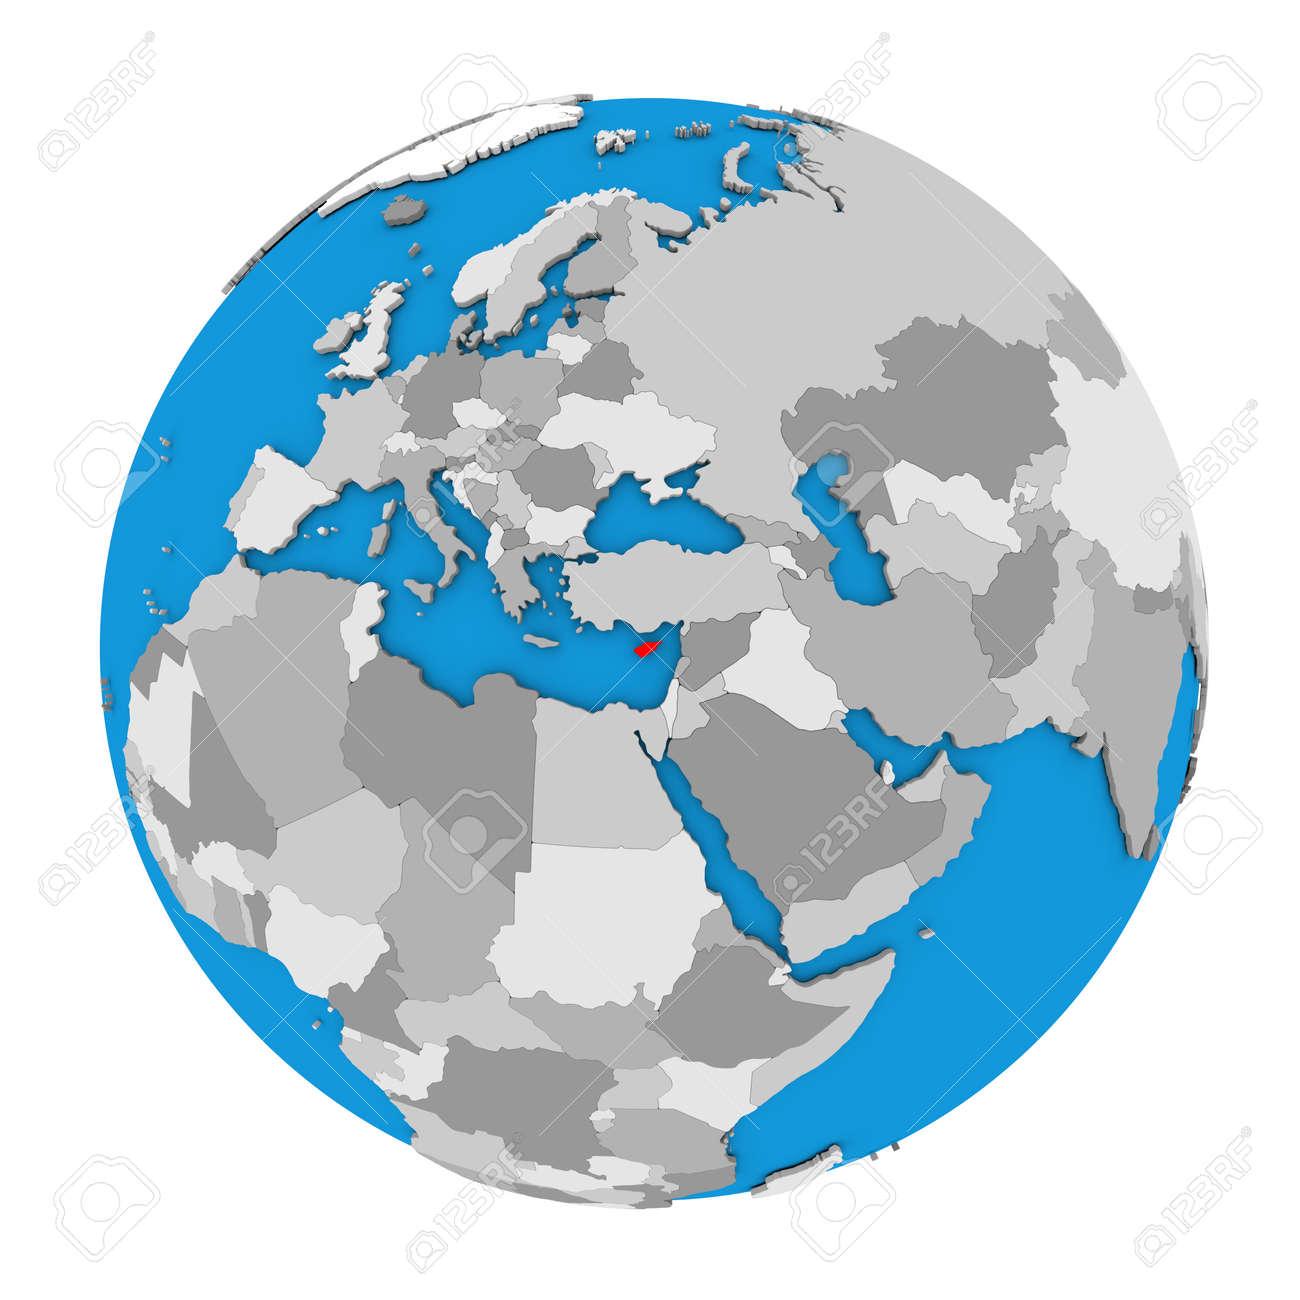 Globus Weltkugel Karte.Stock Photo